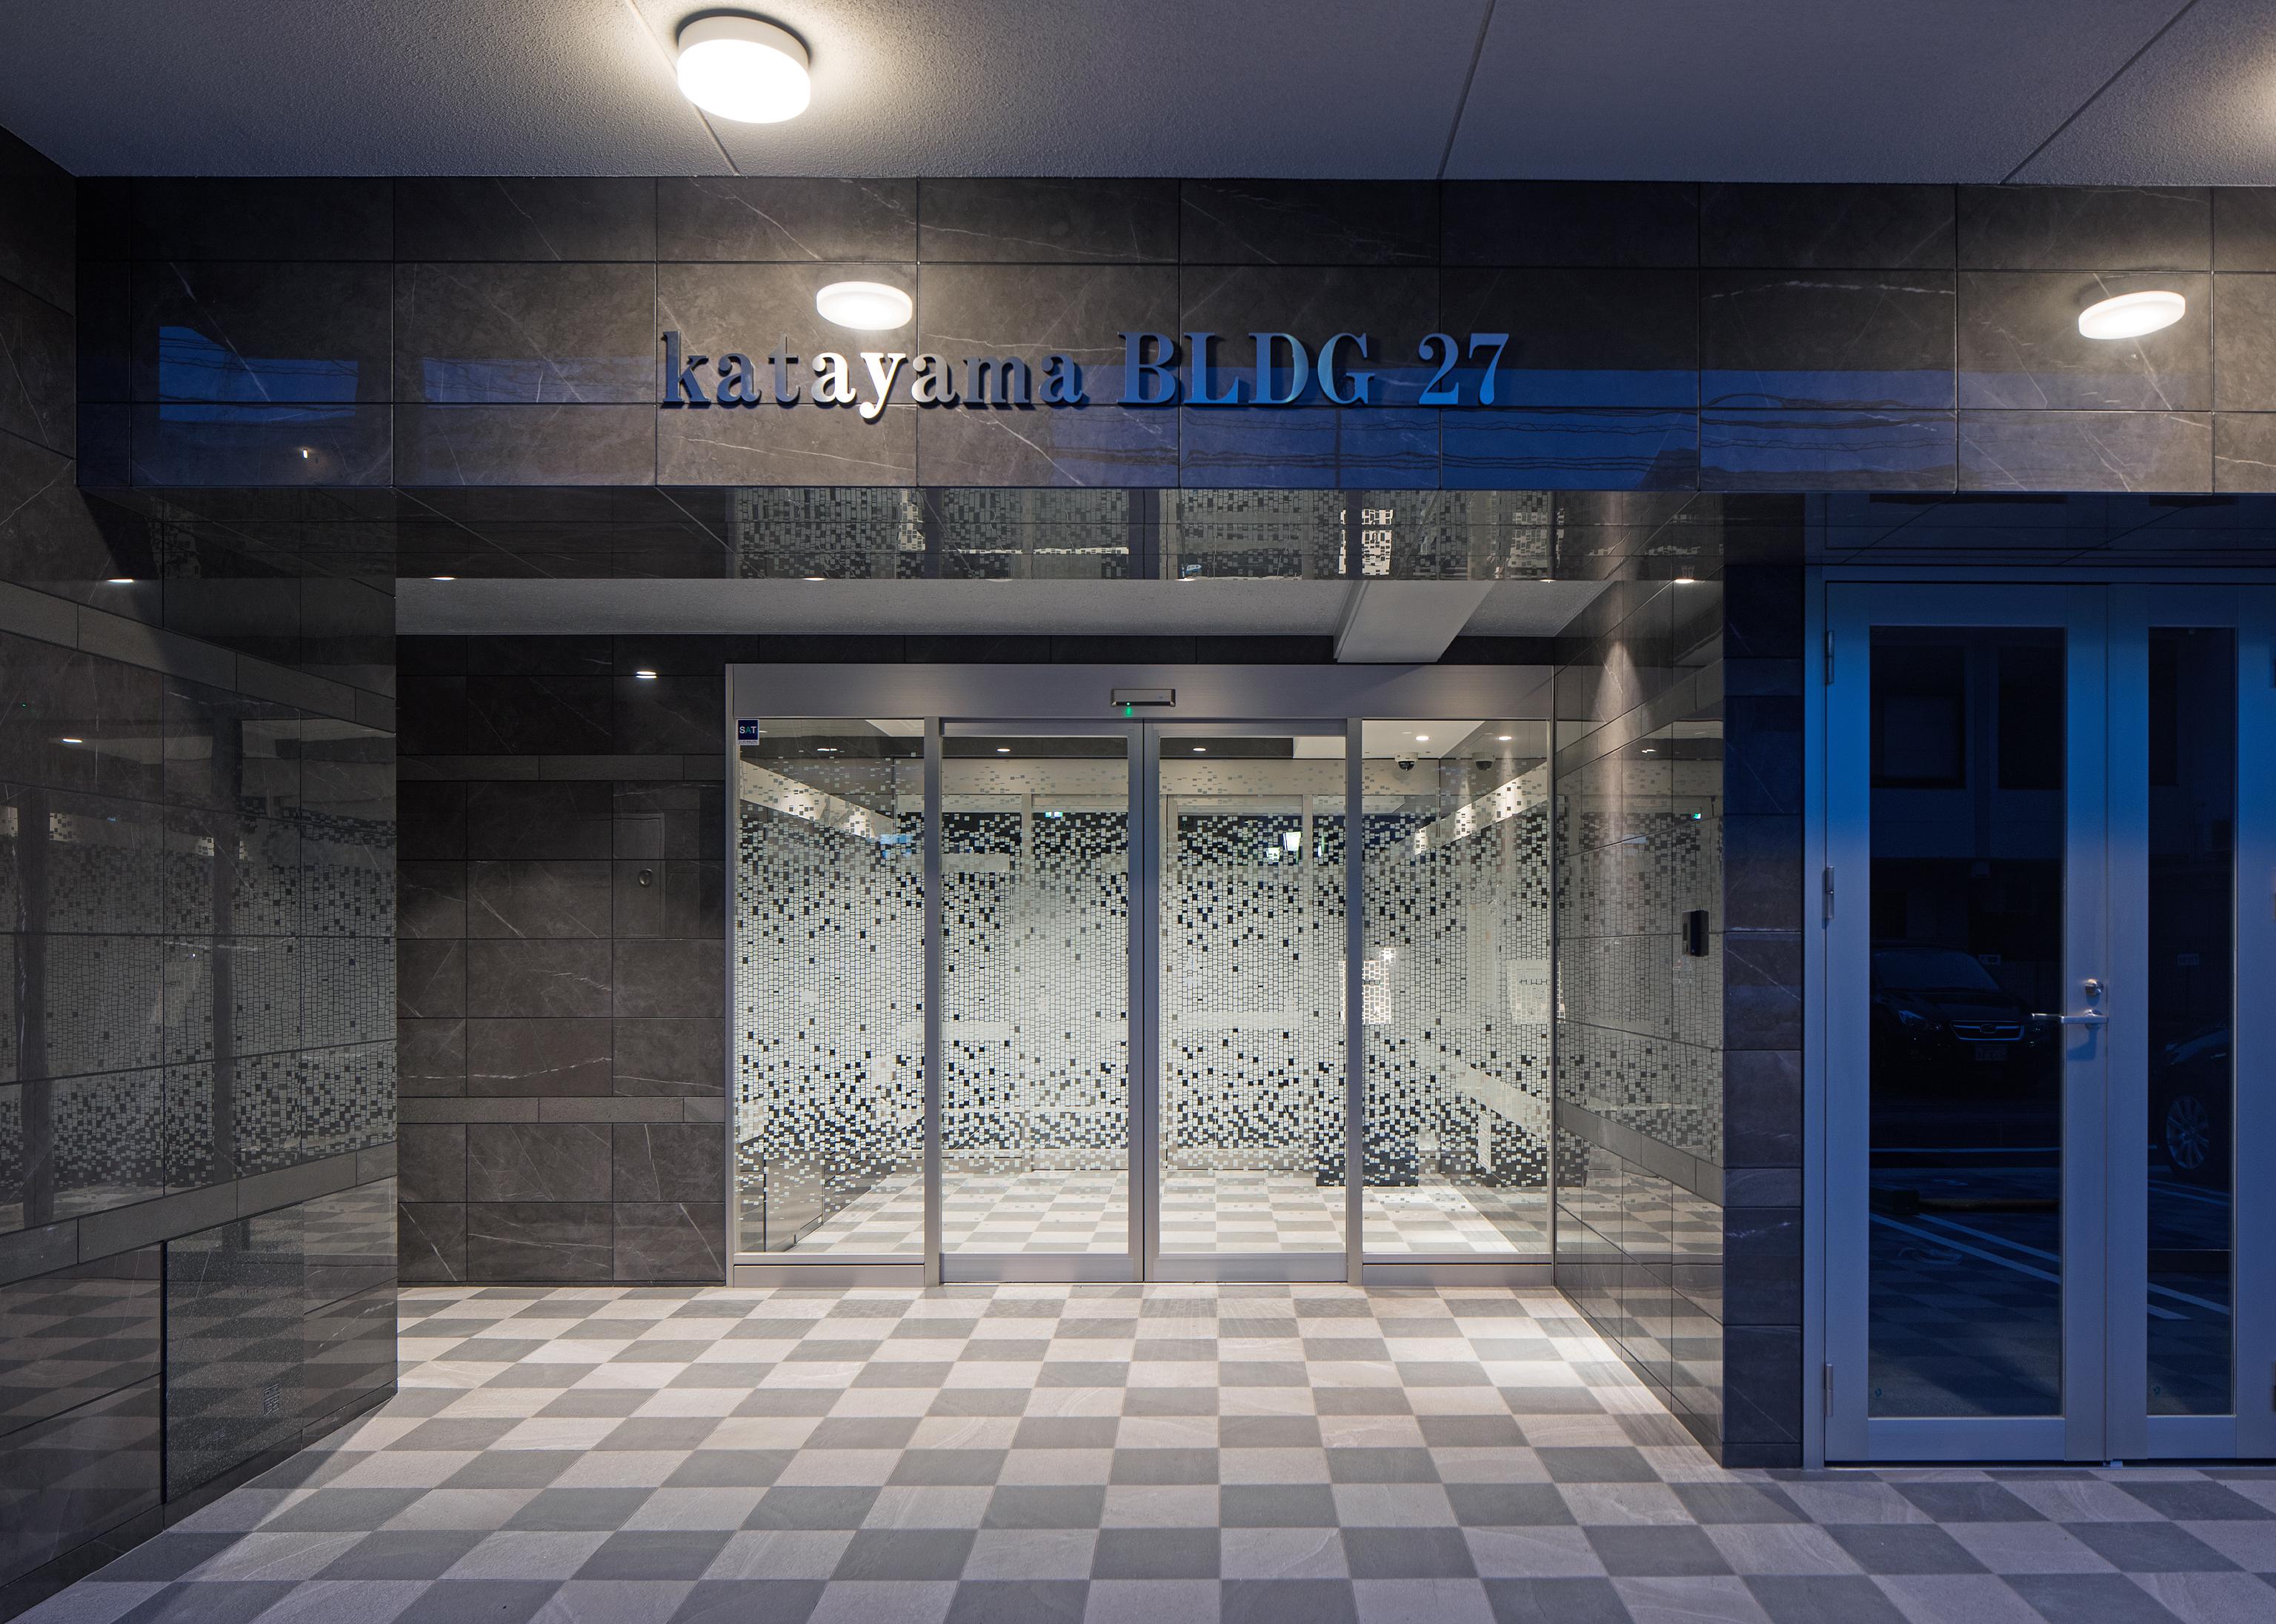 4 katayamaBLDG27 アプローチ夜景